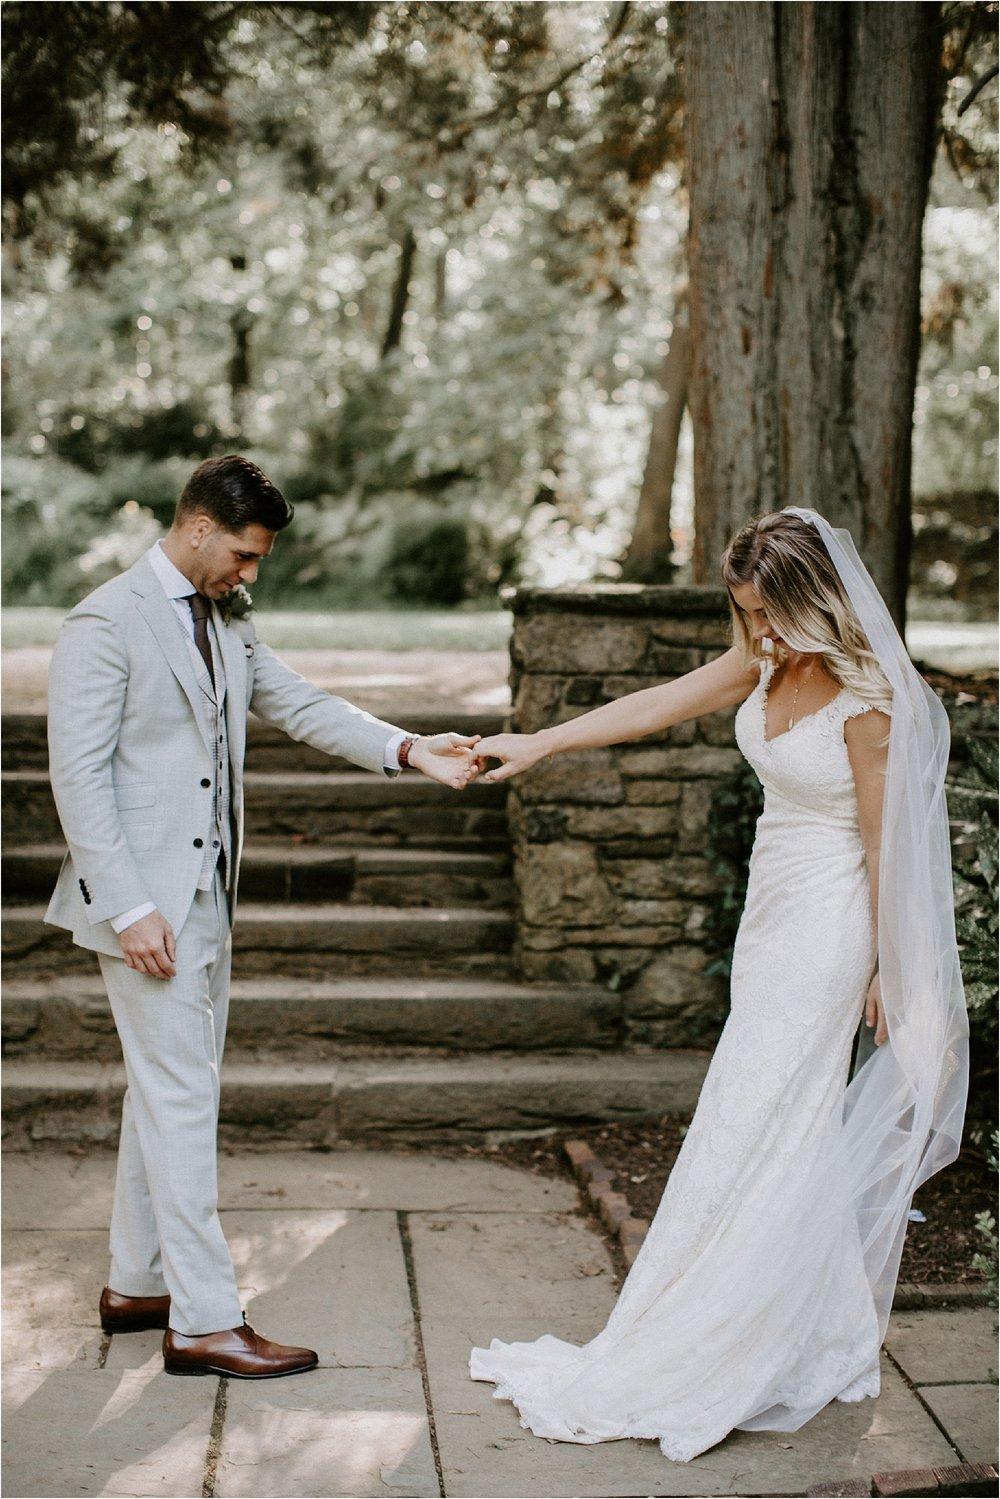 Sarah_Brookhart_Philadelphia_Wedding_Photographer_0037.jpg